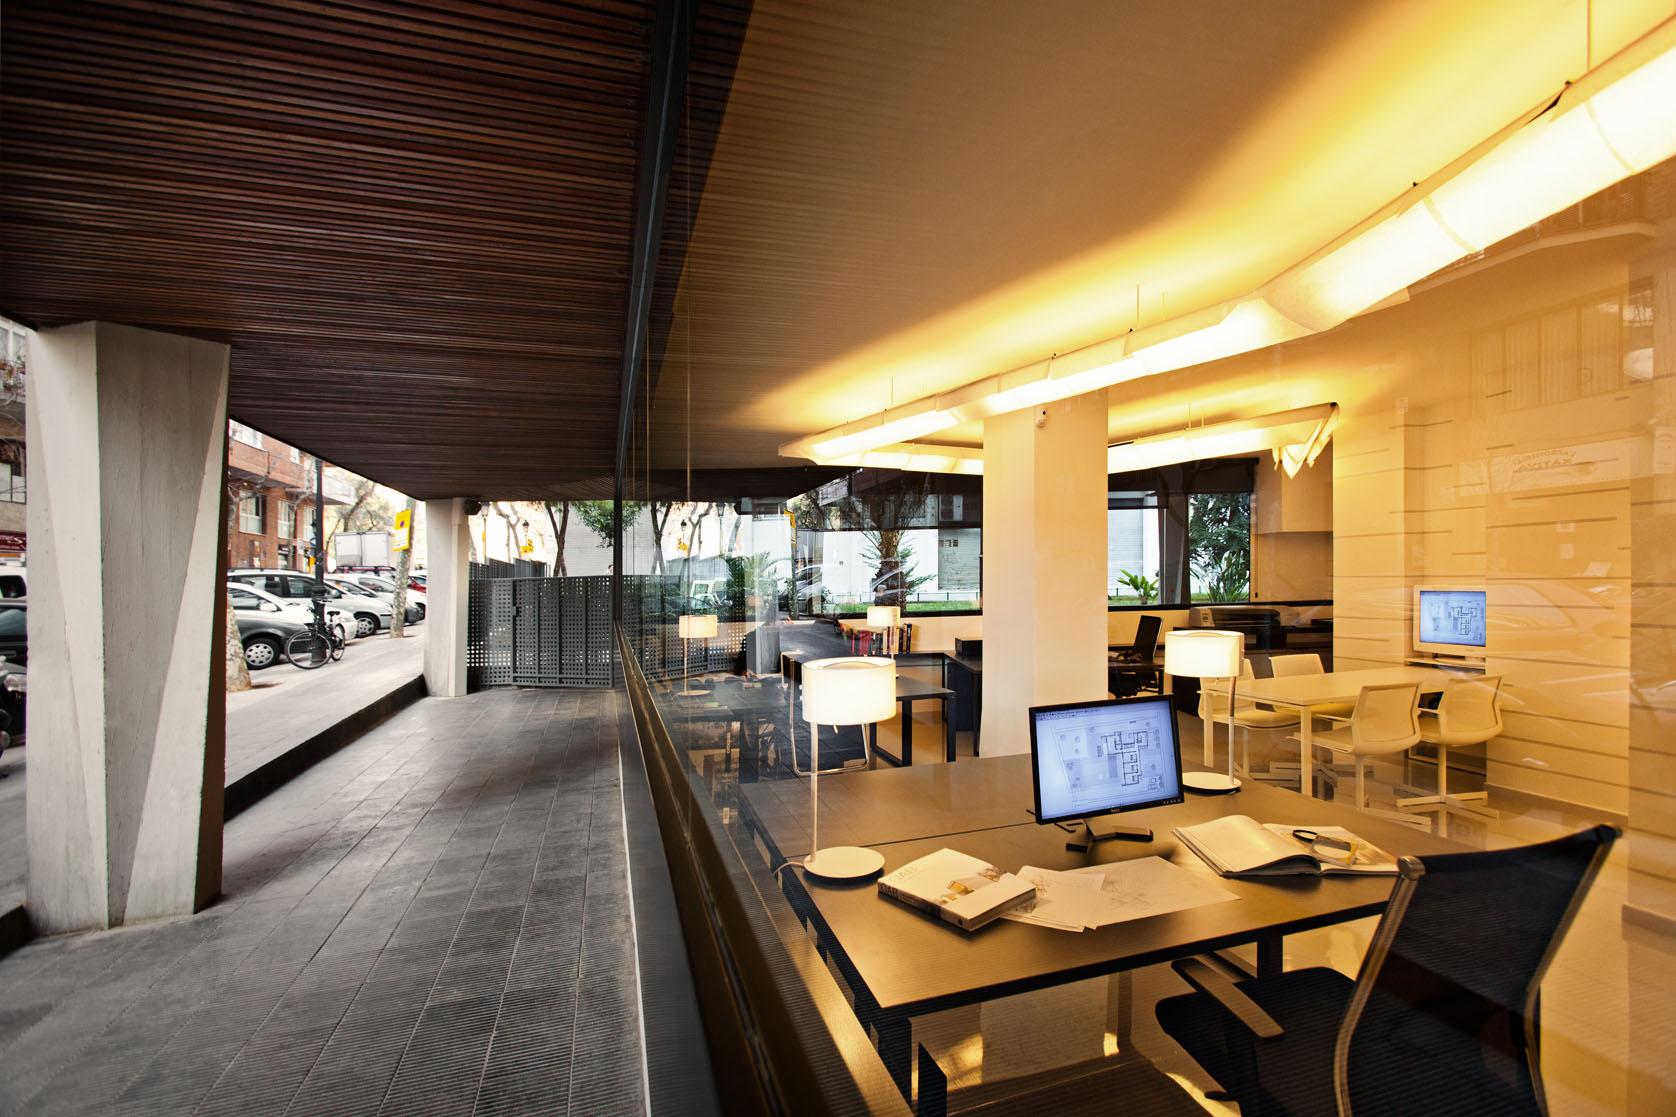 Architecture Studio Space dom studio - dom arquitectura